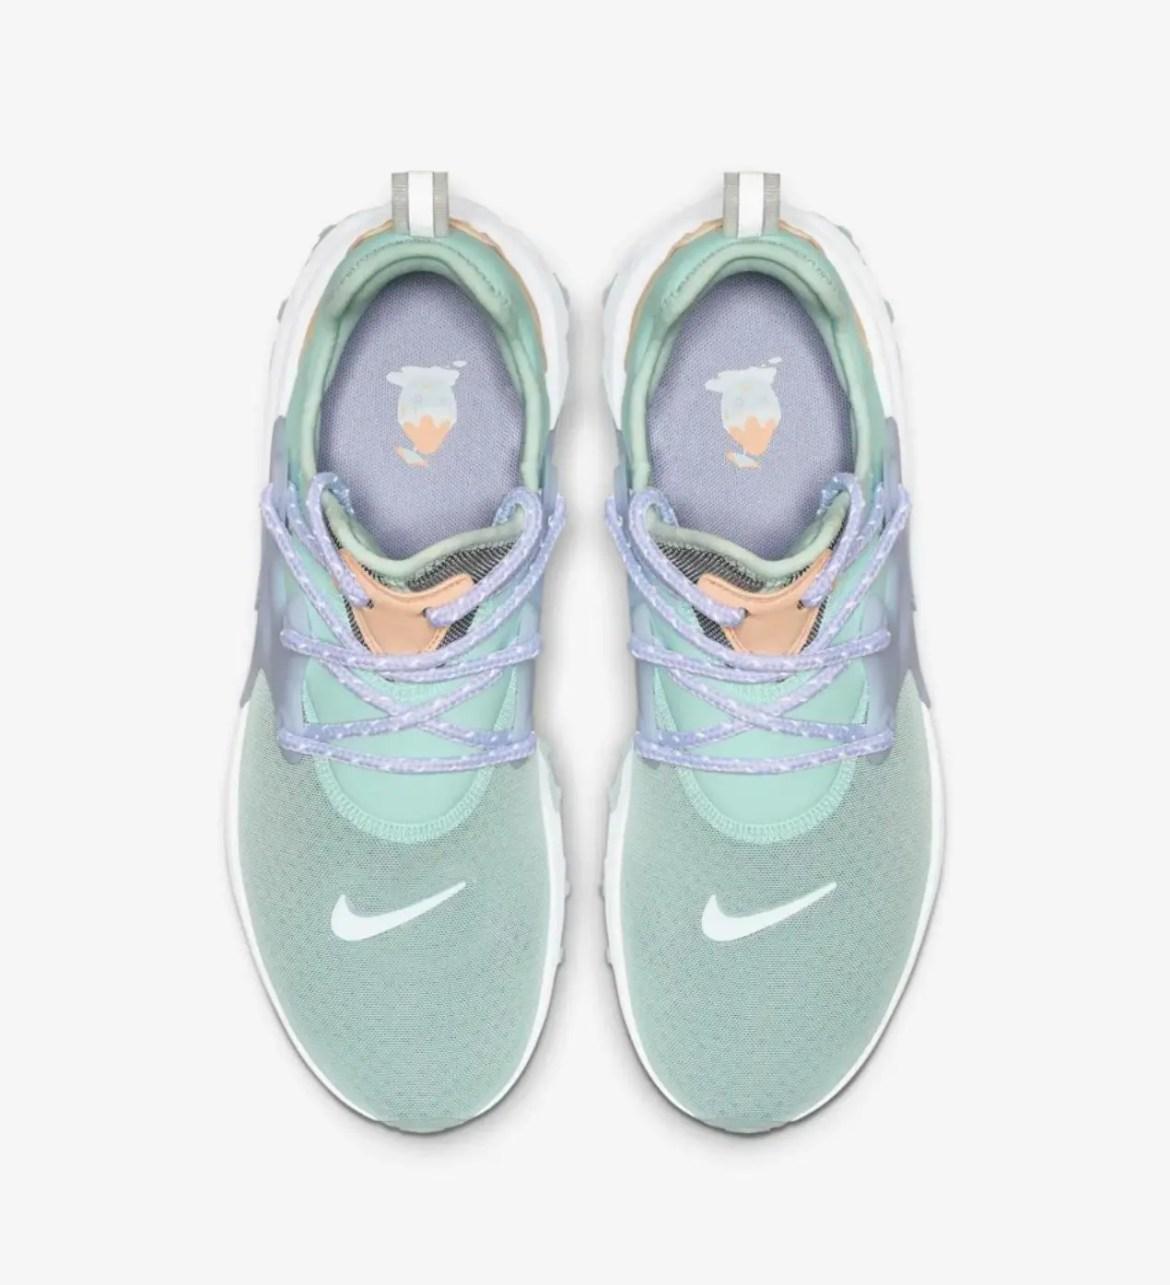 Nike-REACT-PRESTO-SHAVED-ICE-02